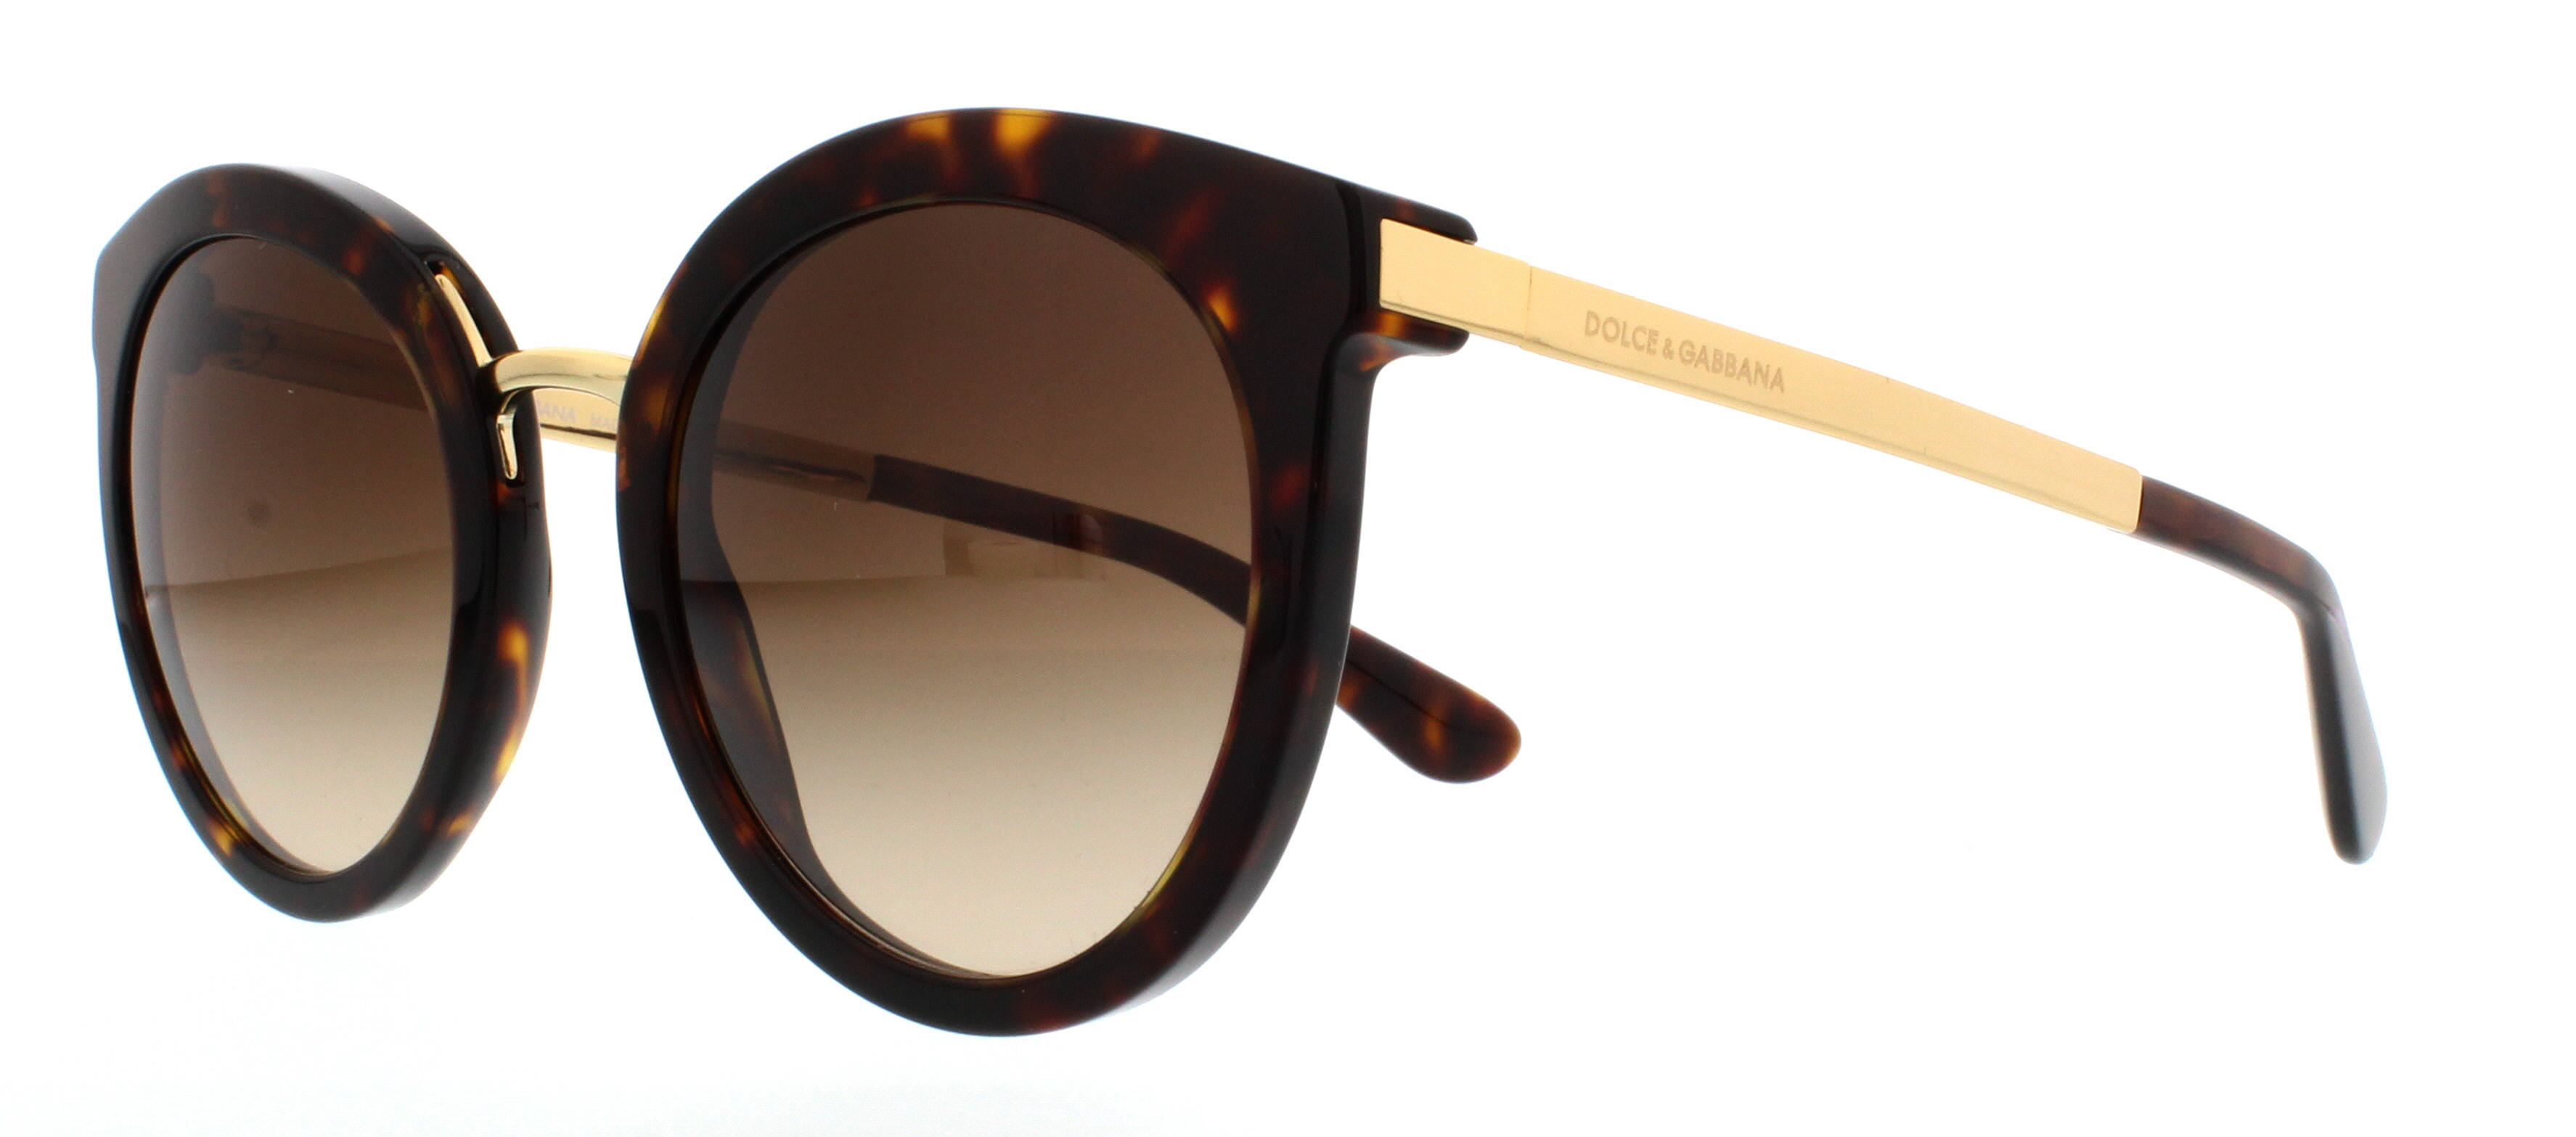 Dolce & Gabbana DG4268 502/13 52-22 6hgpC